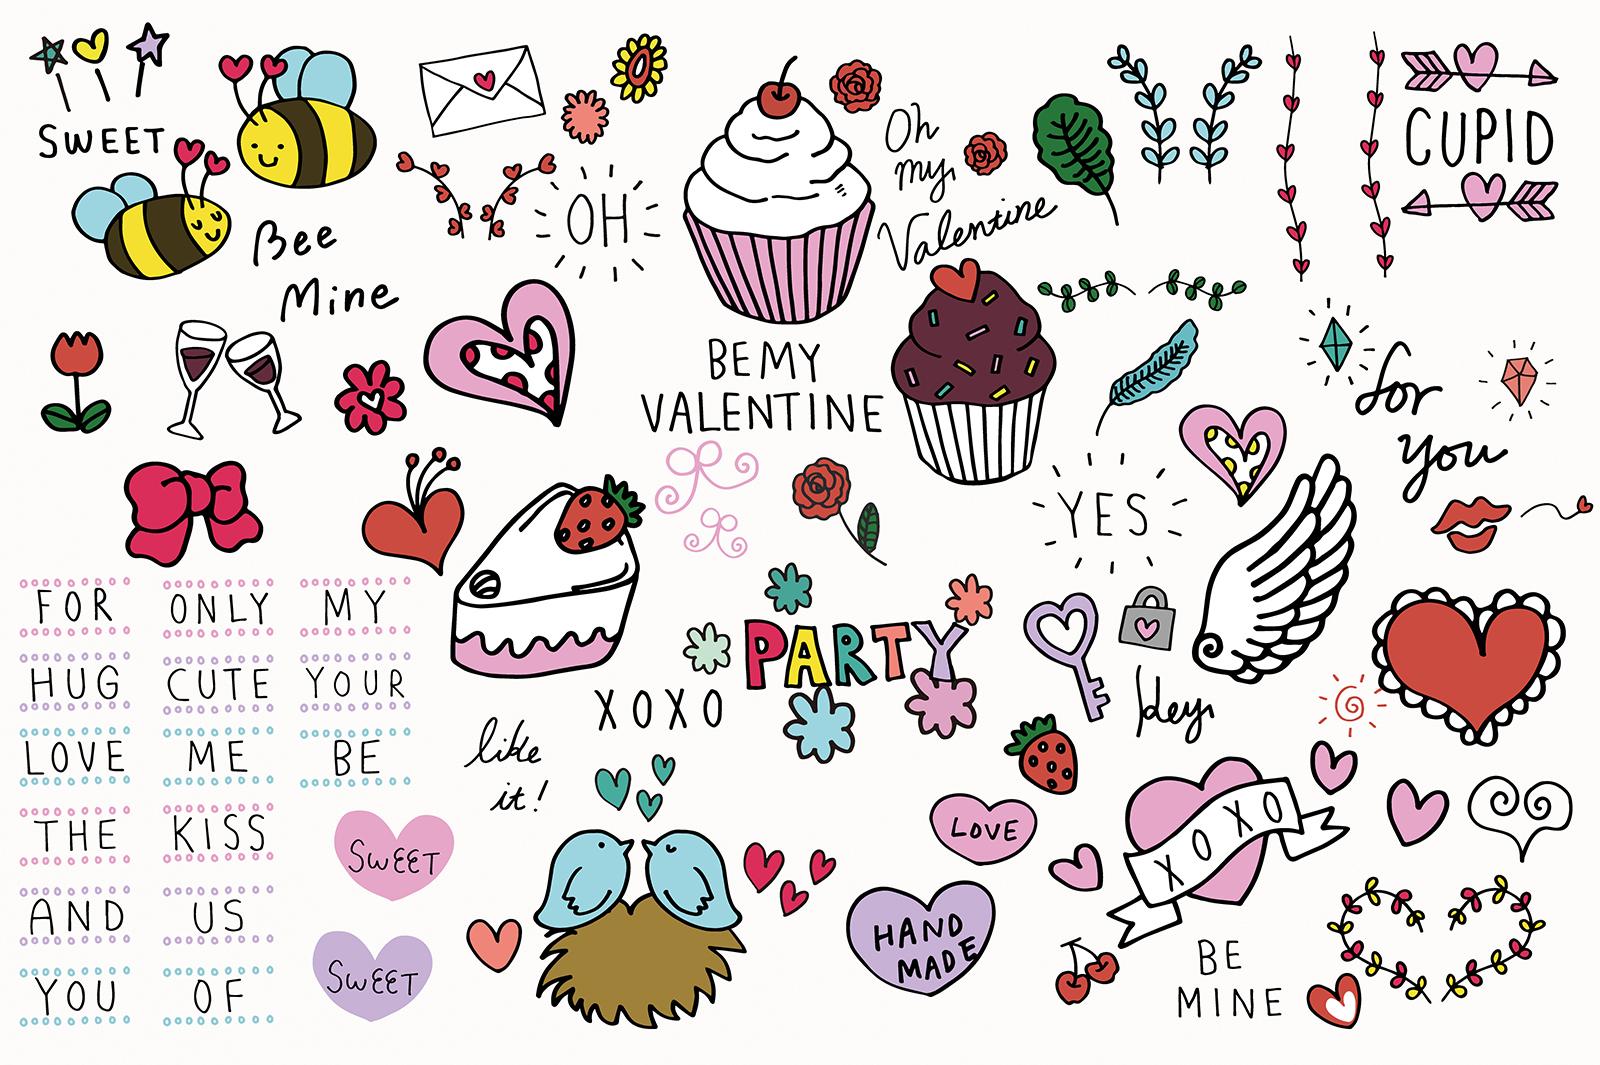 Doodled Illustration 01 Valentines example image 1